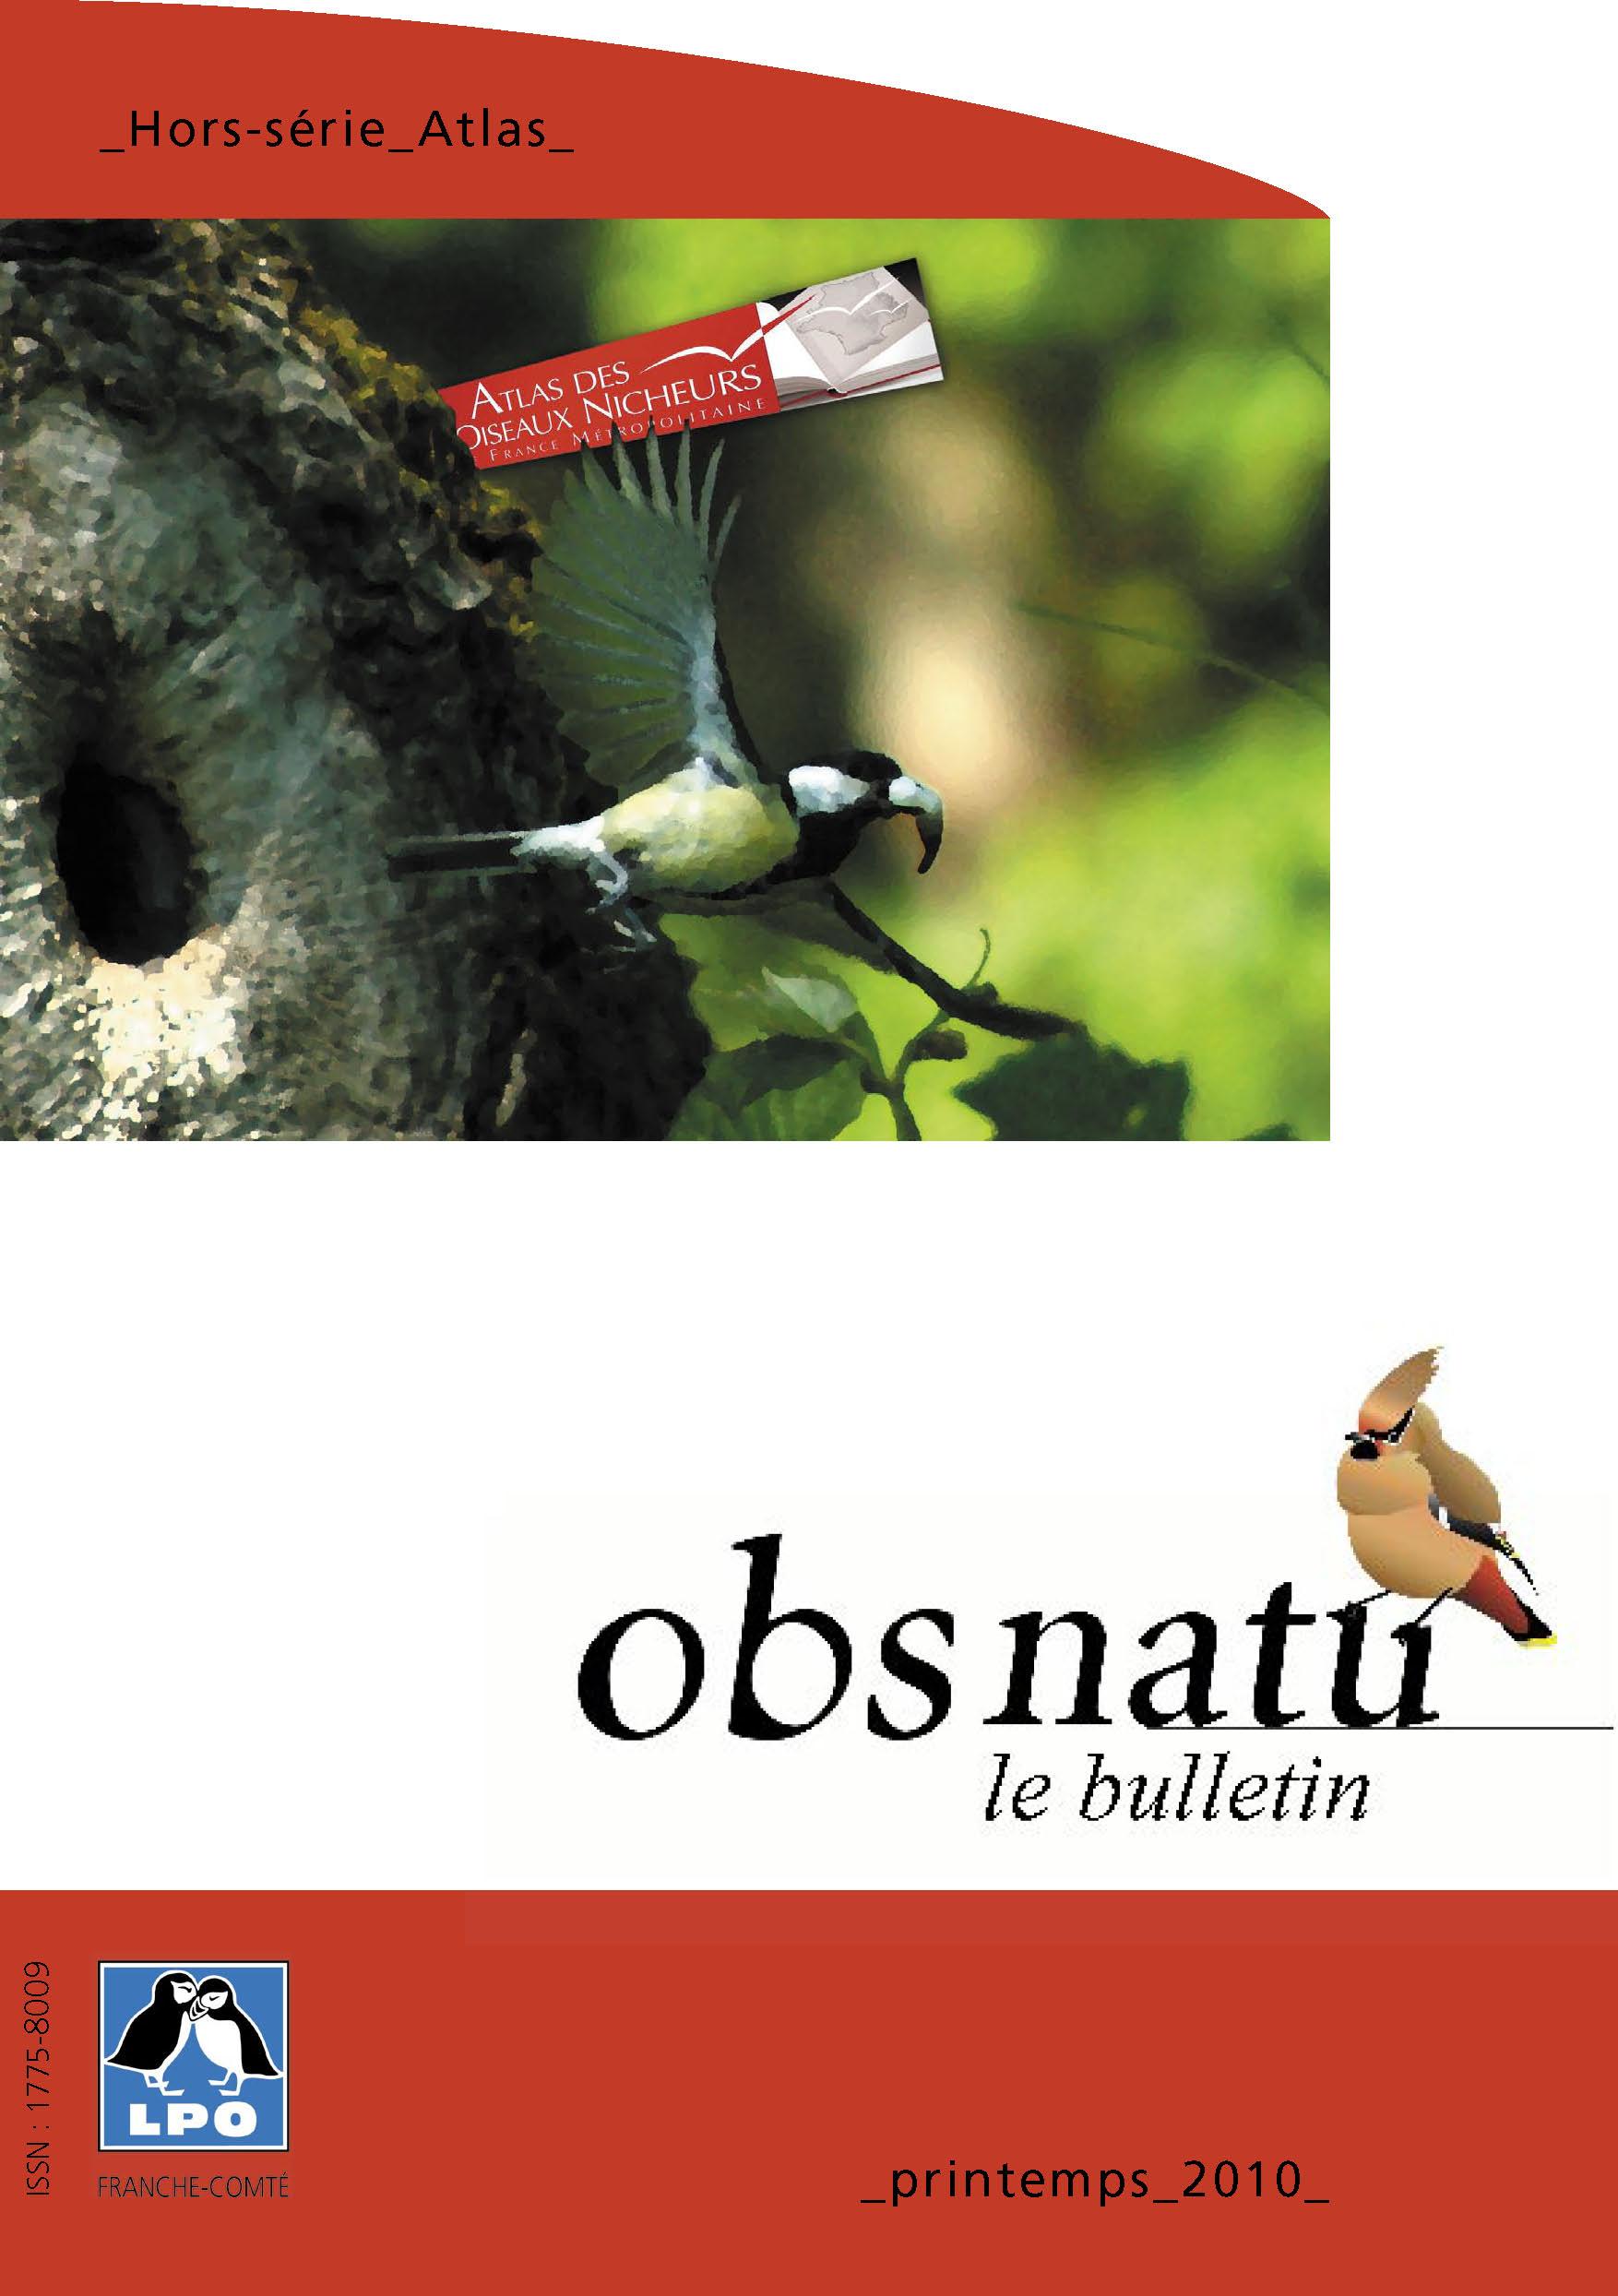 https://cdnfiles1.biolovision.net/franche-comte.lpo.fr/userfiles/publications/ObsnatuHSAtlasPage01.jpg